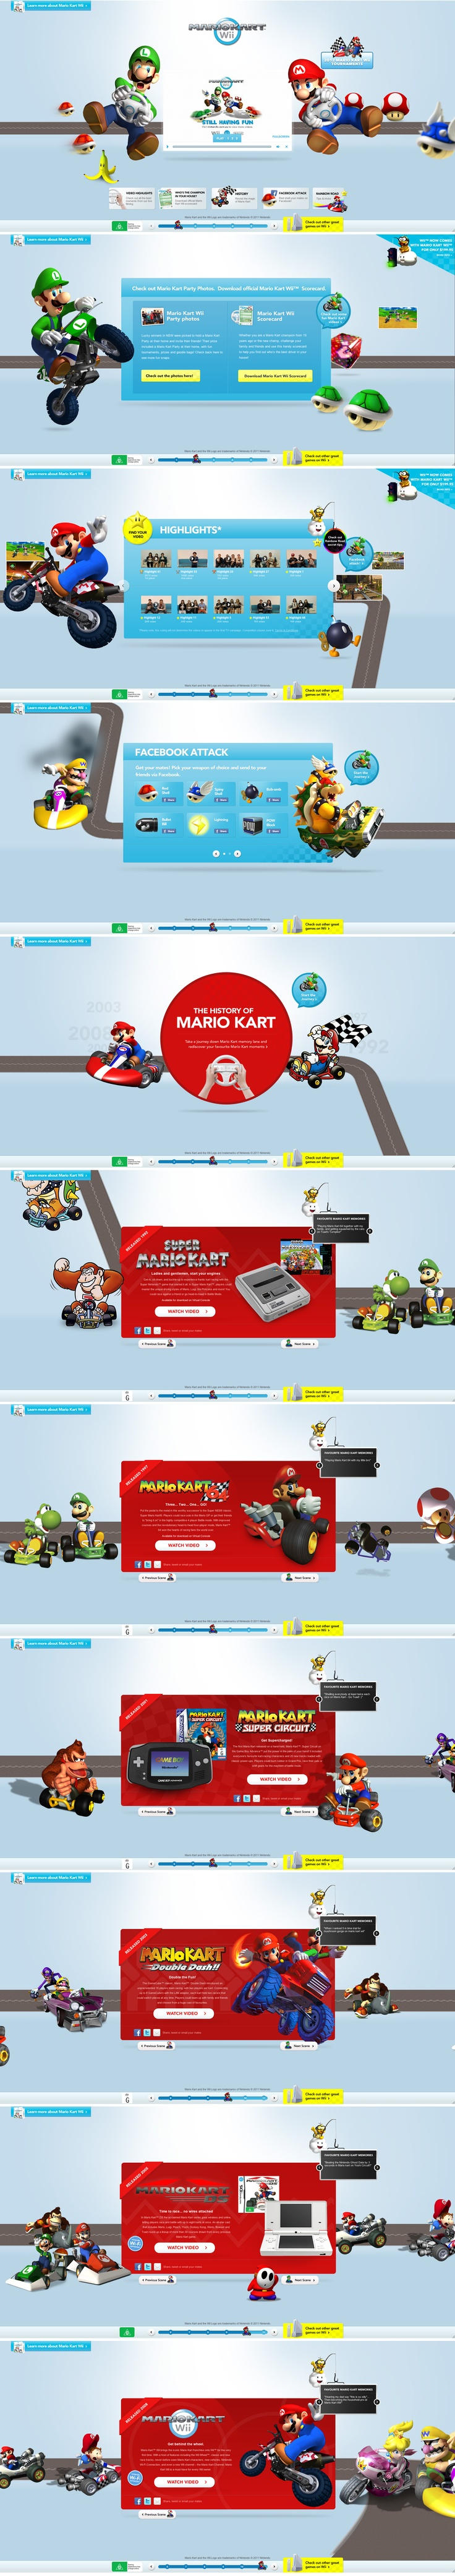 Mario Kart Wii by Nintendo #web design scrolling experience